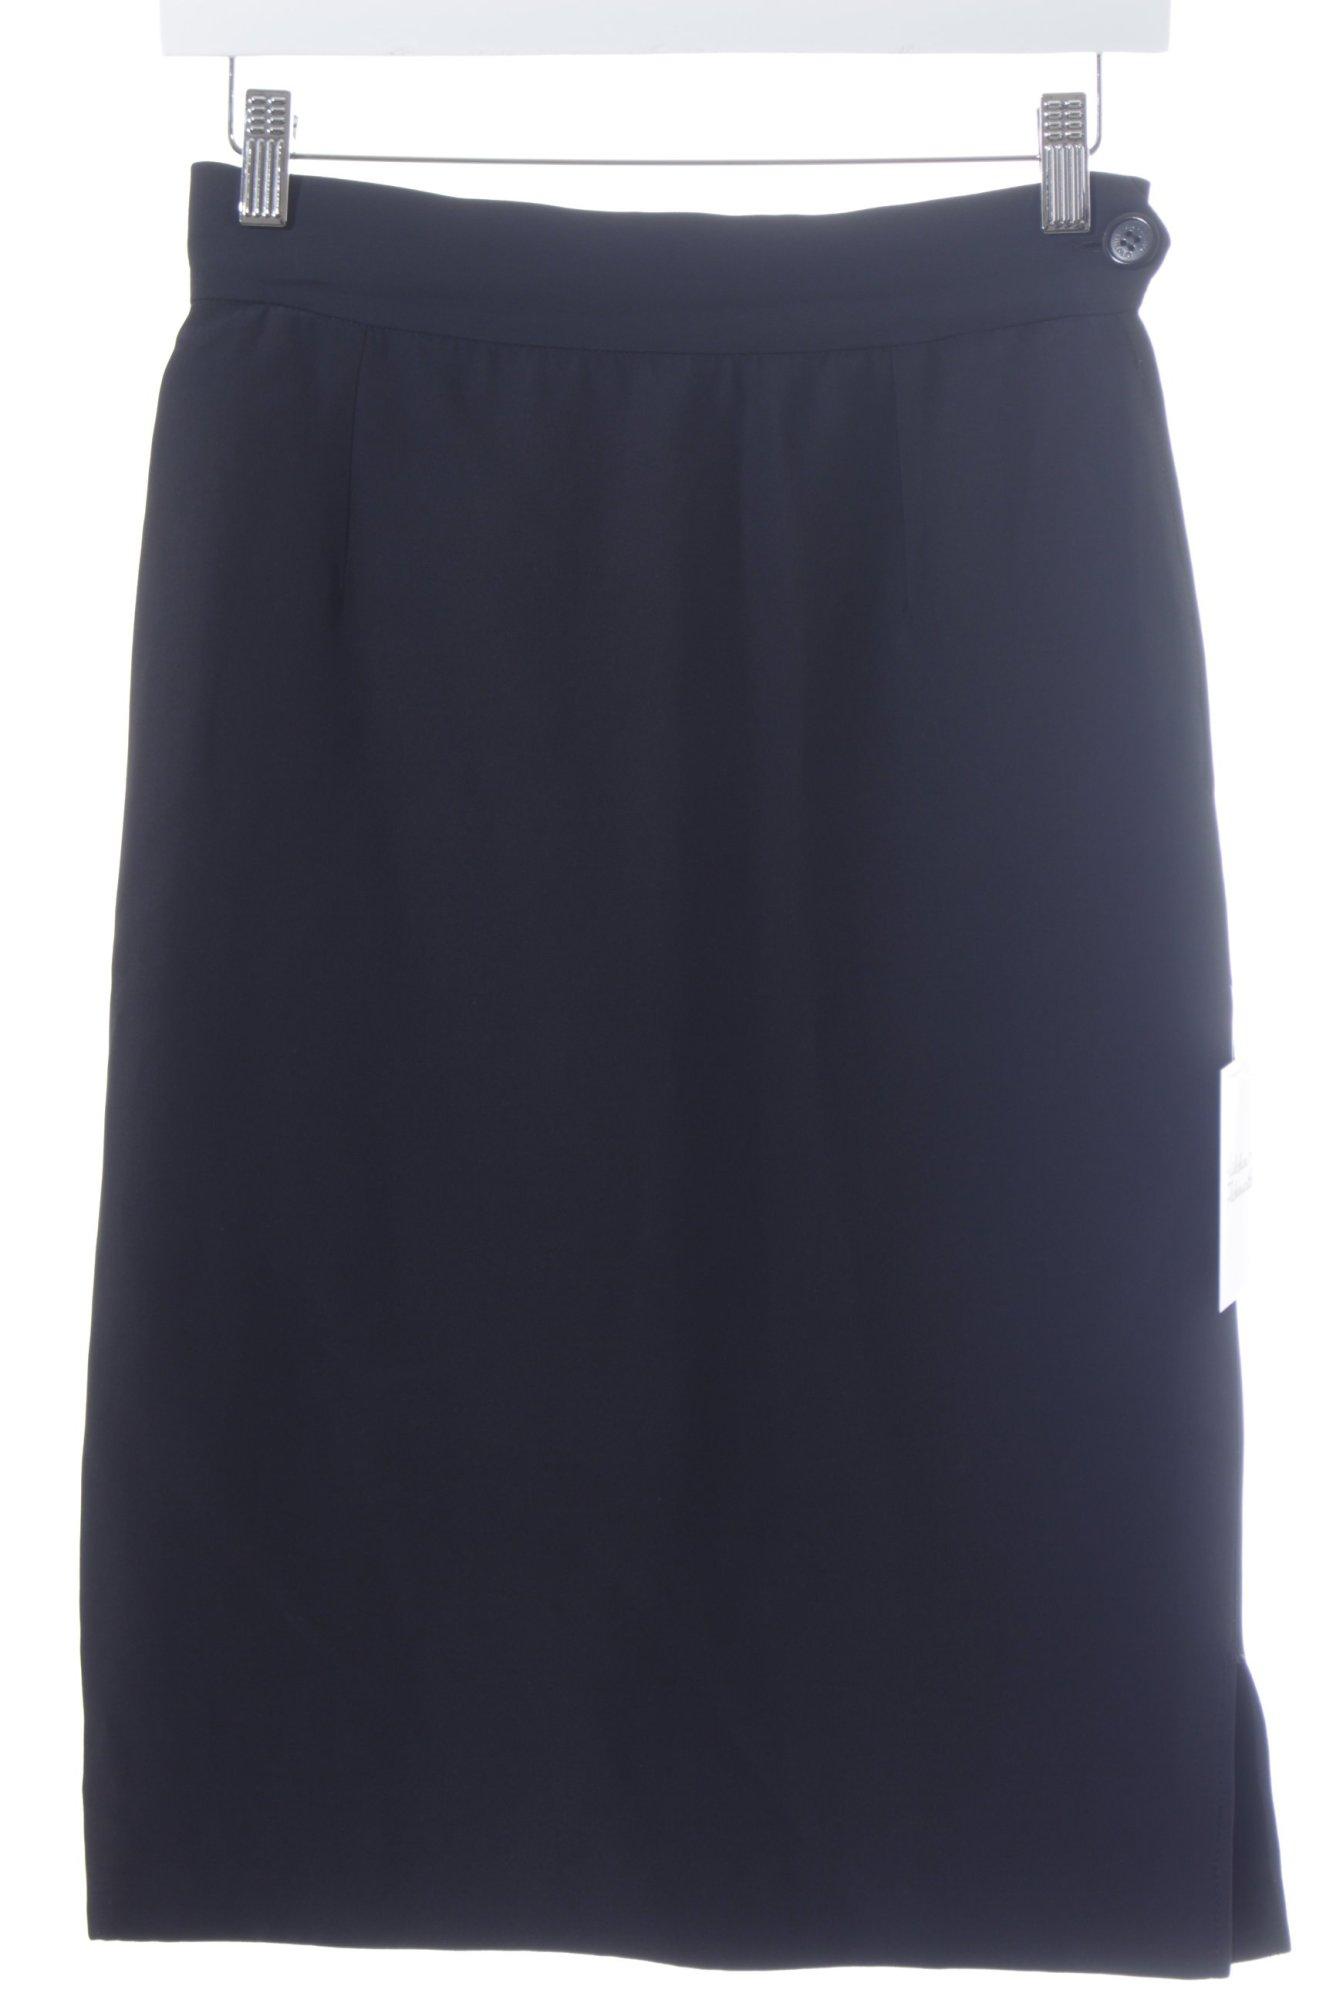 MOSCHINO-Falda-de-tubo-negro-estilo-business-Mujeres-Talla-EU-36